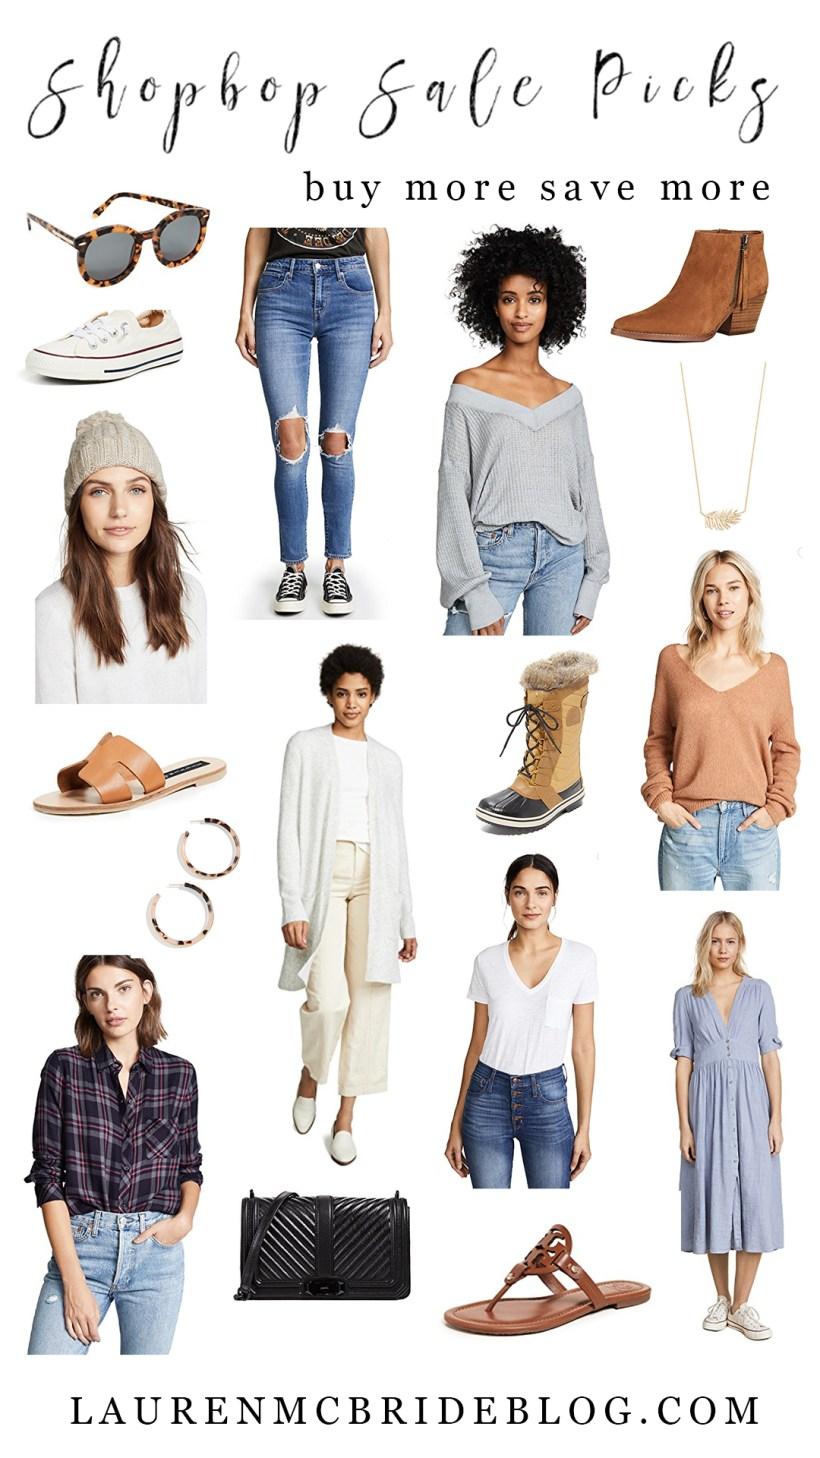 Connecticut life and style blogger Lauren McBride shares her Shopbop September sale picks.Connecticut life and style blogger Lauren McBride shares her Shopbop September sale picks.